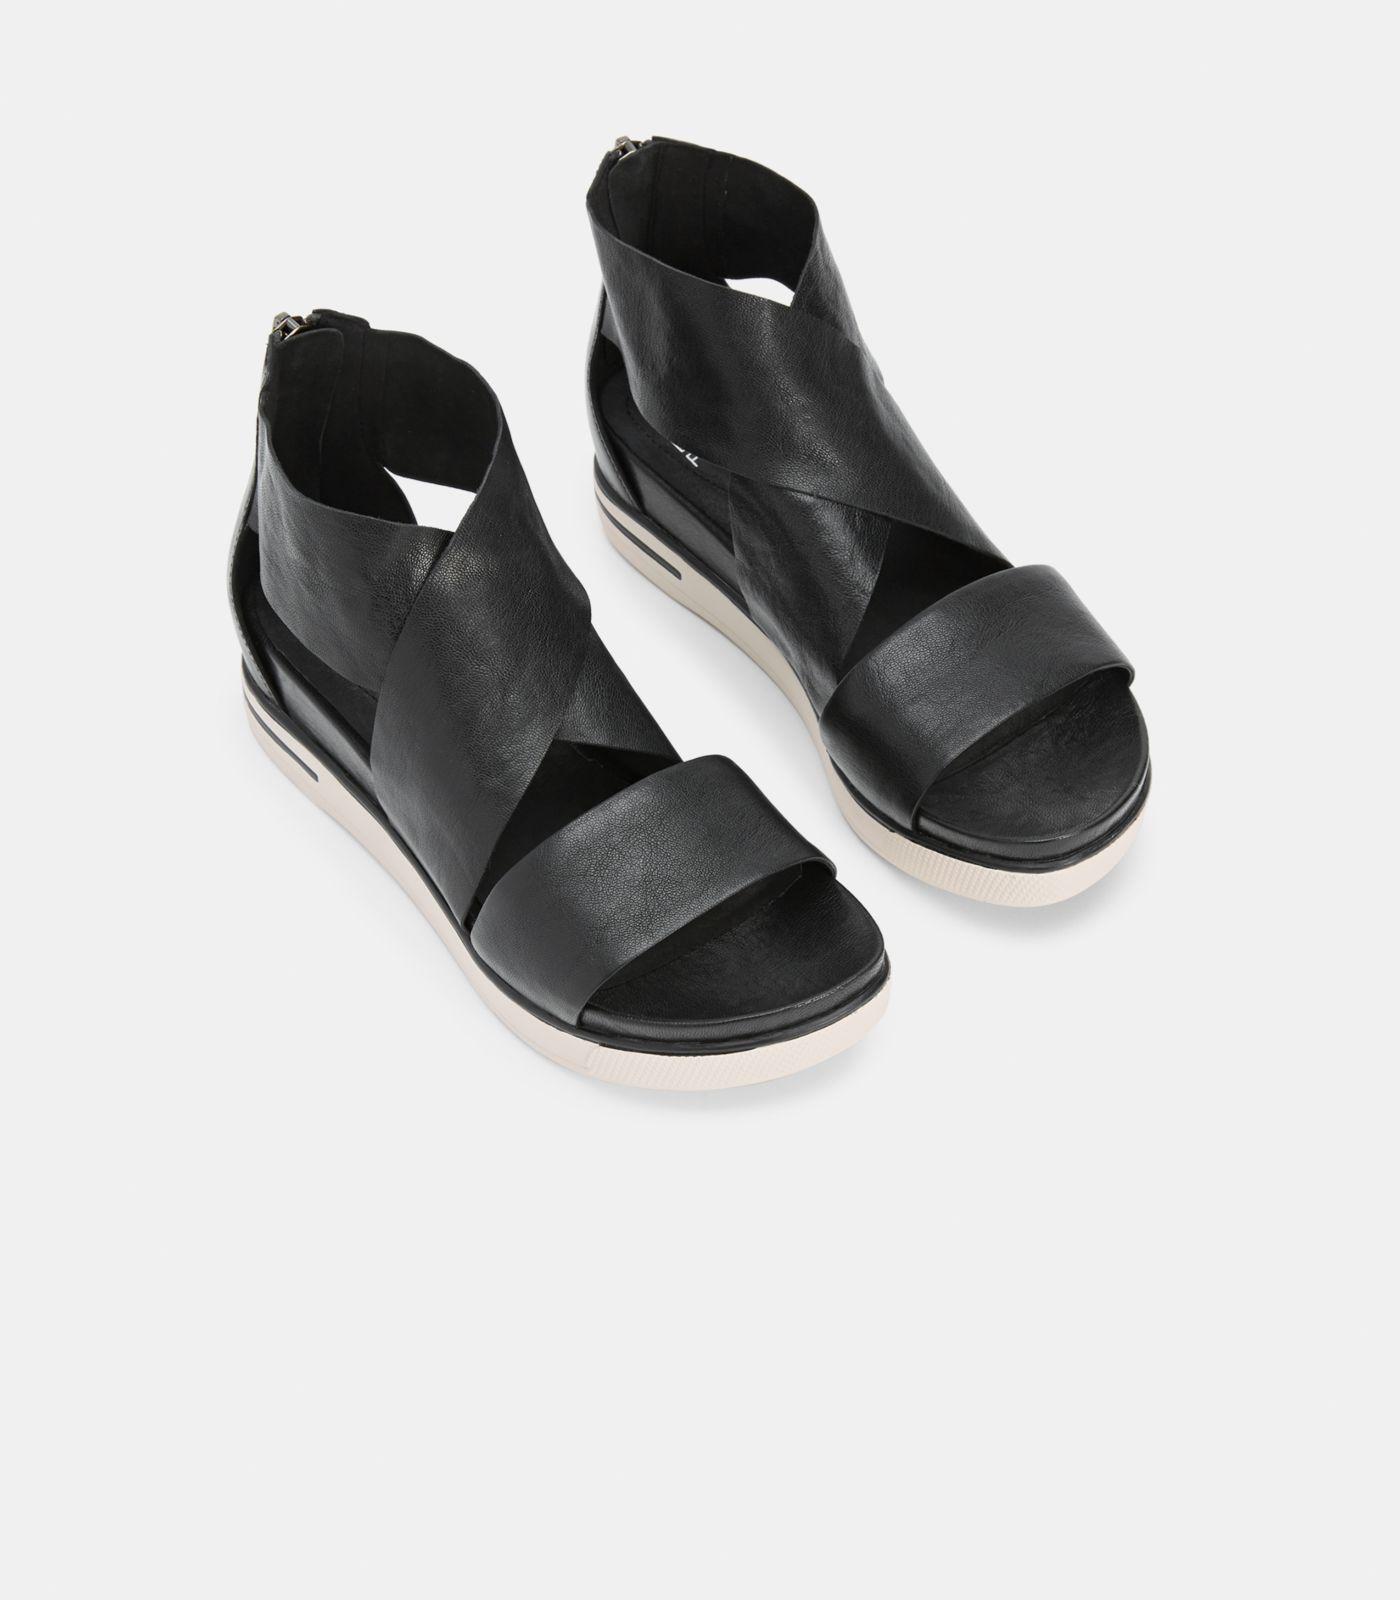 390eb3978 Lyst - Eileen Fisher Sport Leather Sneaker Sandal in Black - Save 39%